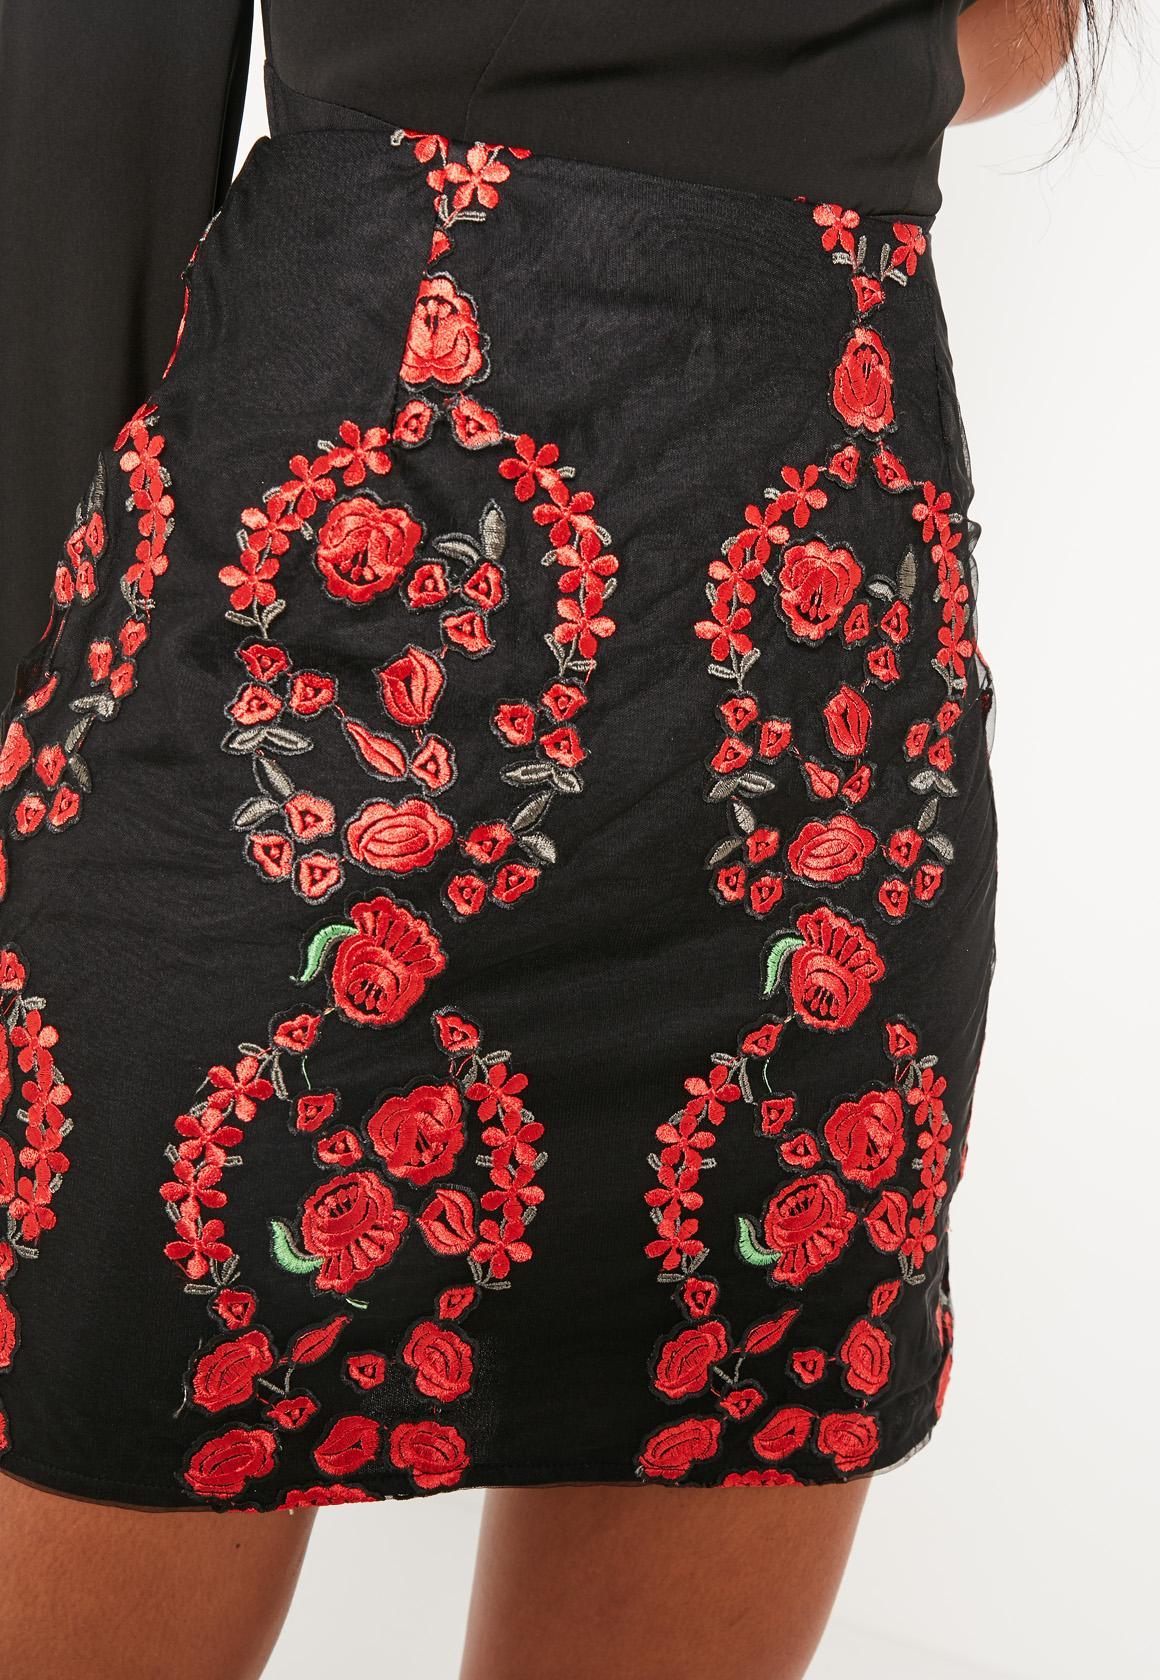 Floral Embroidered Mini Skirt Black